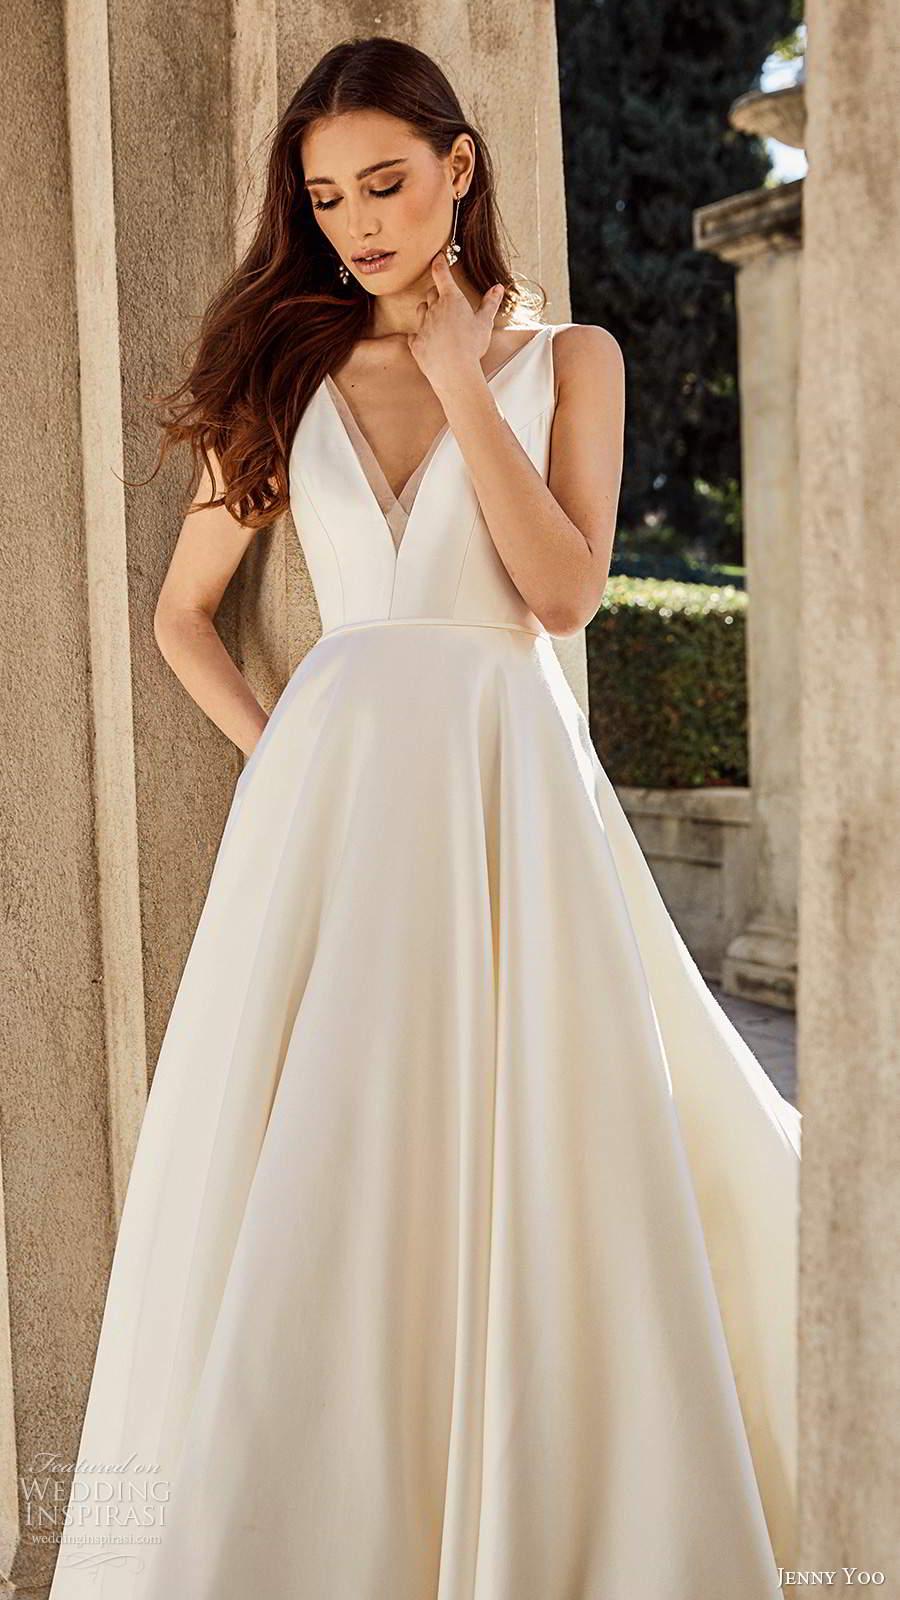 jenny yoo spring 2020 bridal sleeeless straps v neckline minimalist clean a line ball gown wedding dress v back chapel train (5) zv